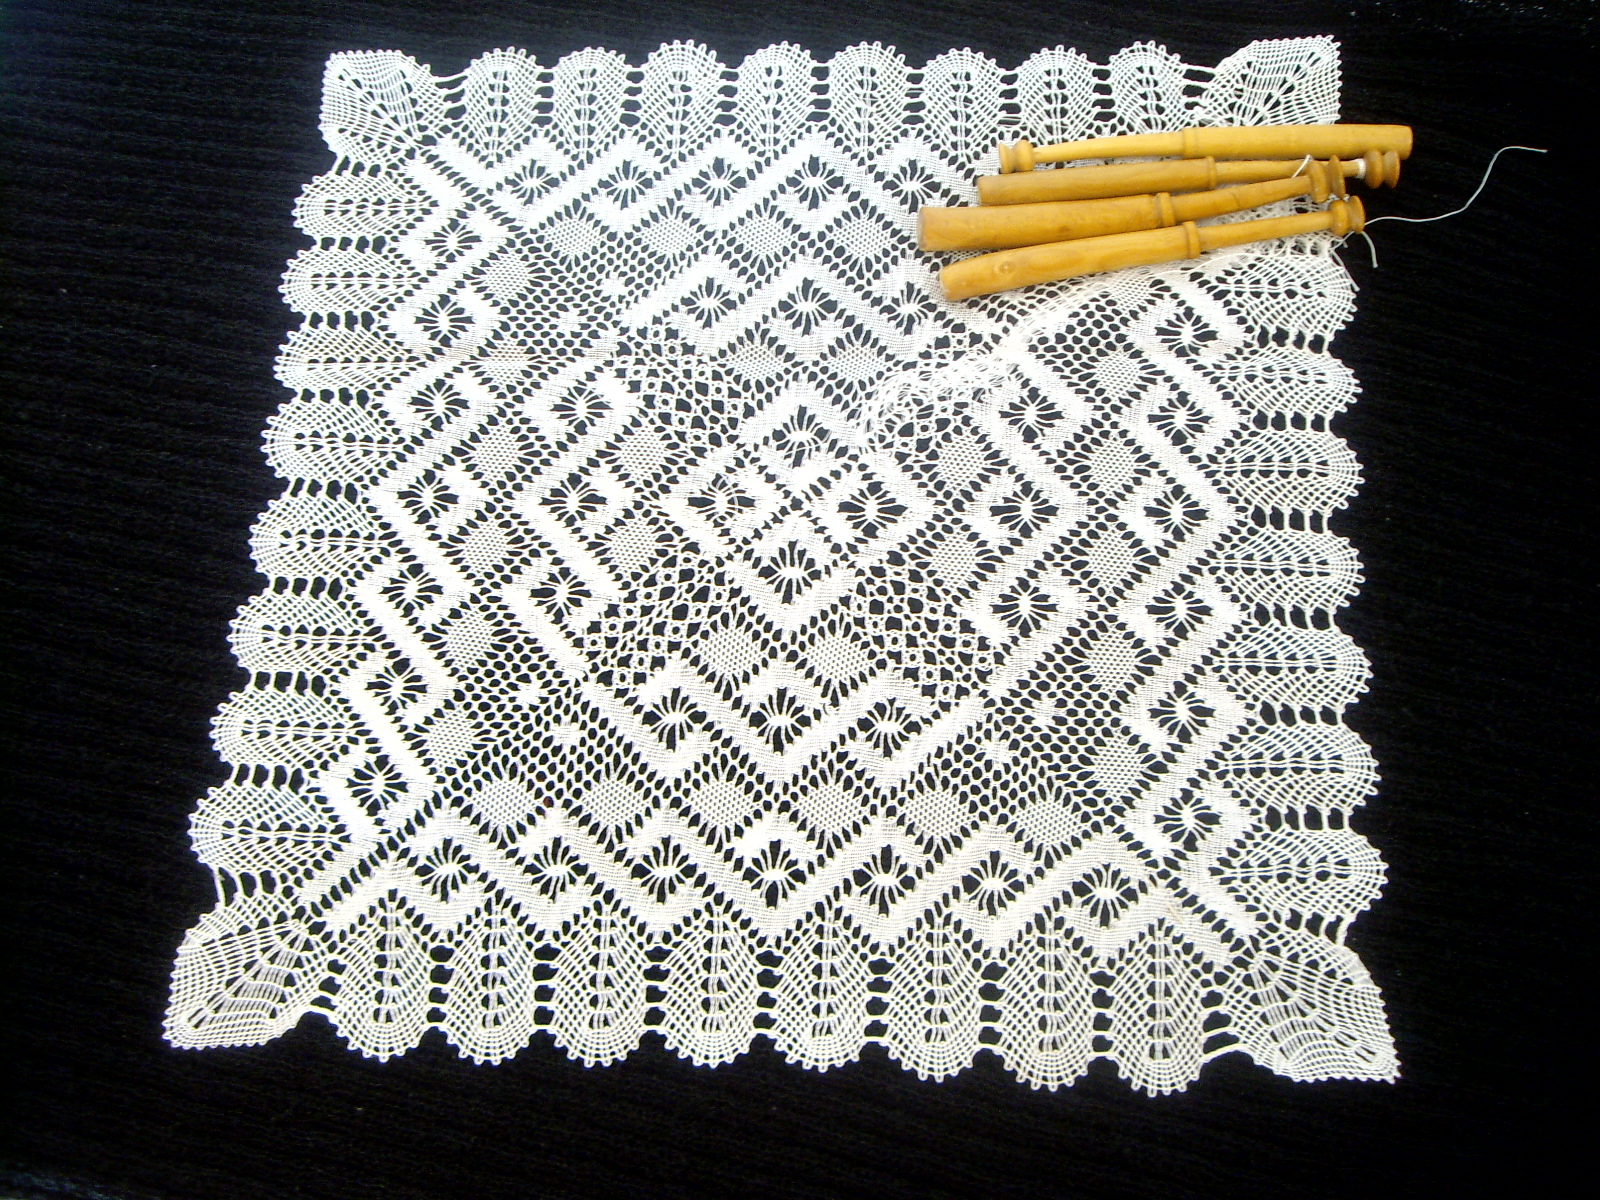 Increíble Patrón De Crochet Libre Para Pañuelos Infinito Galería ...